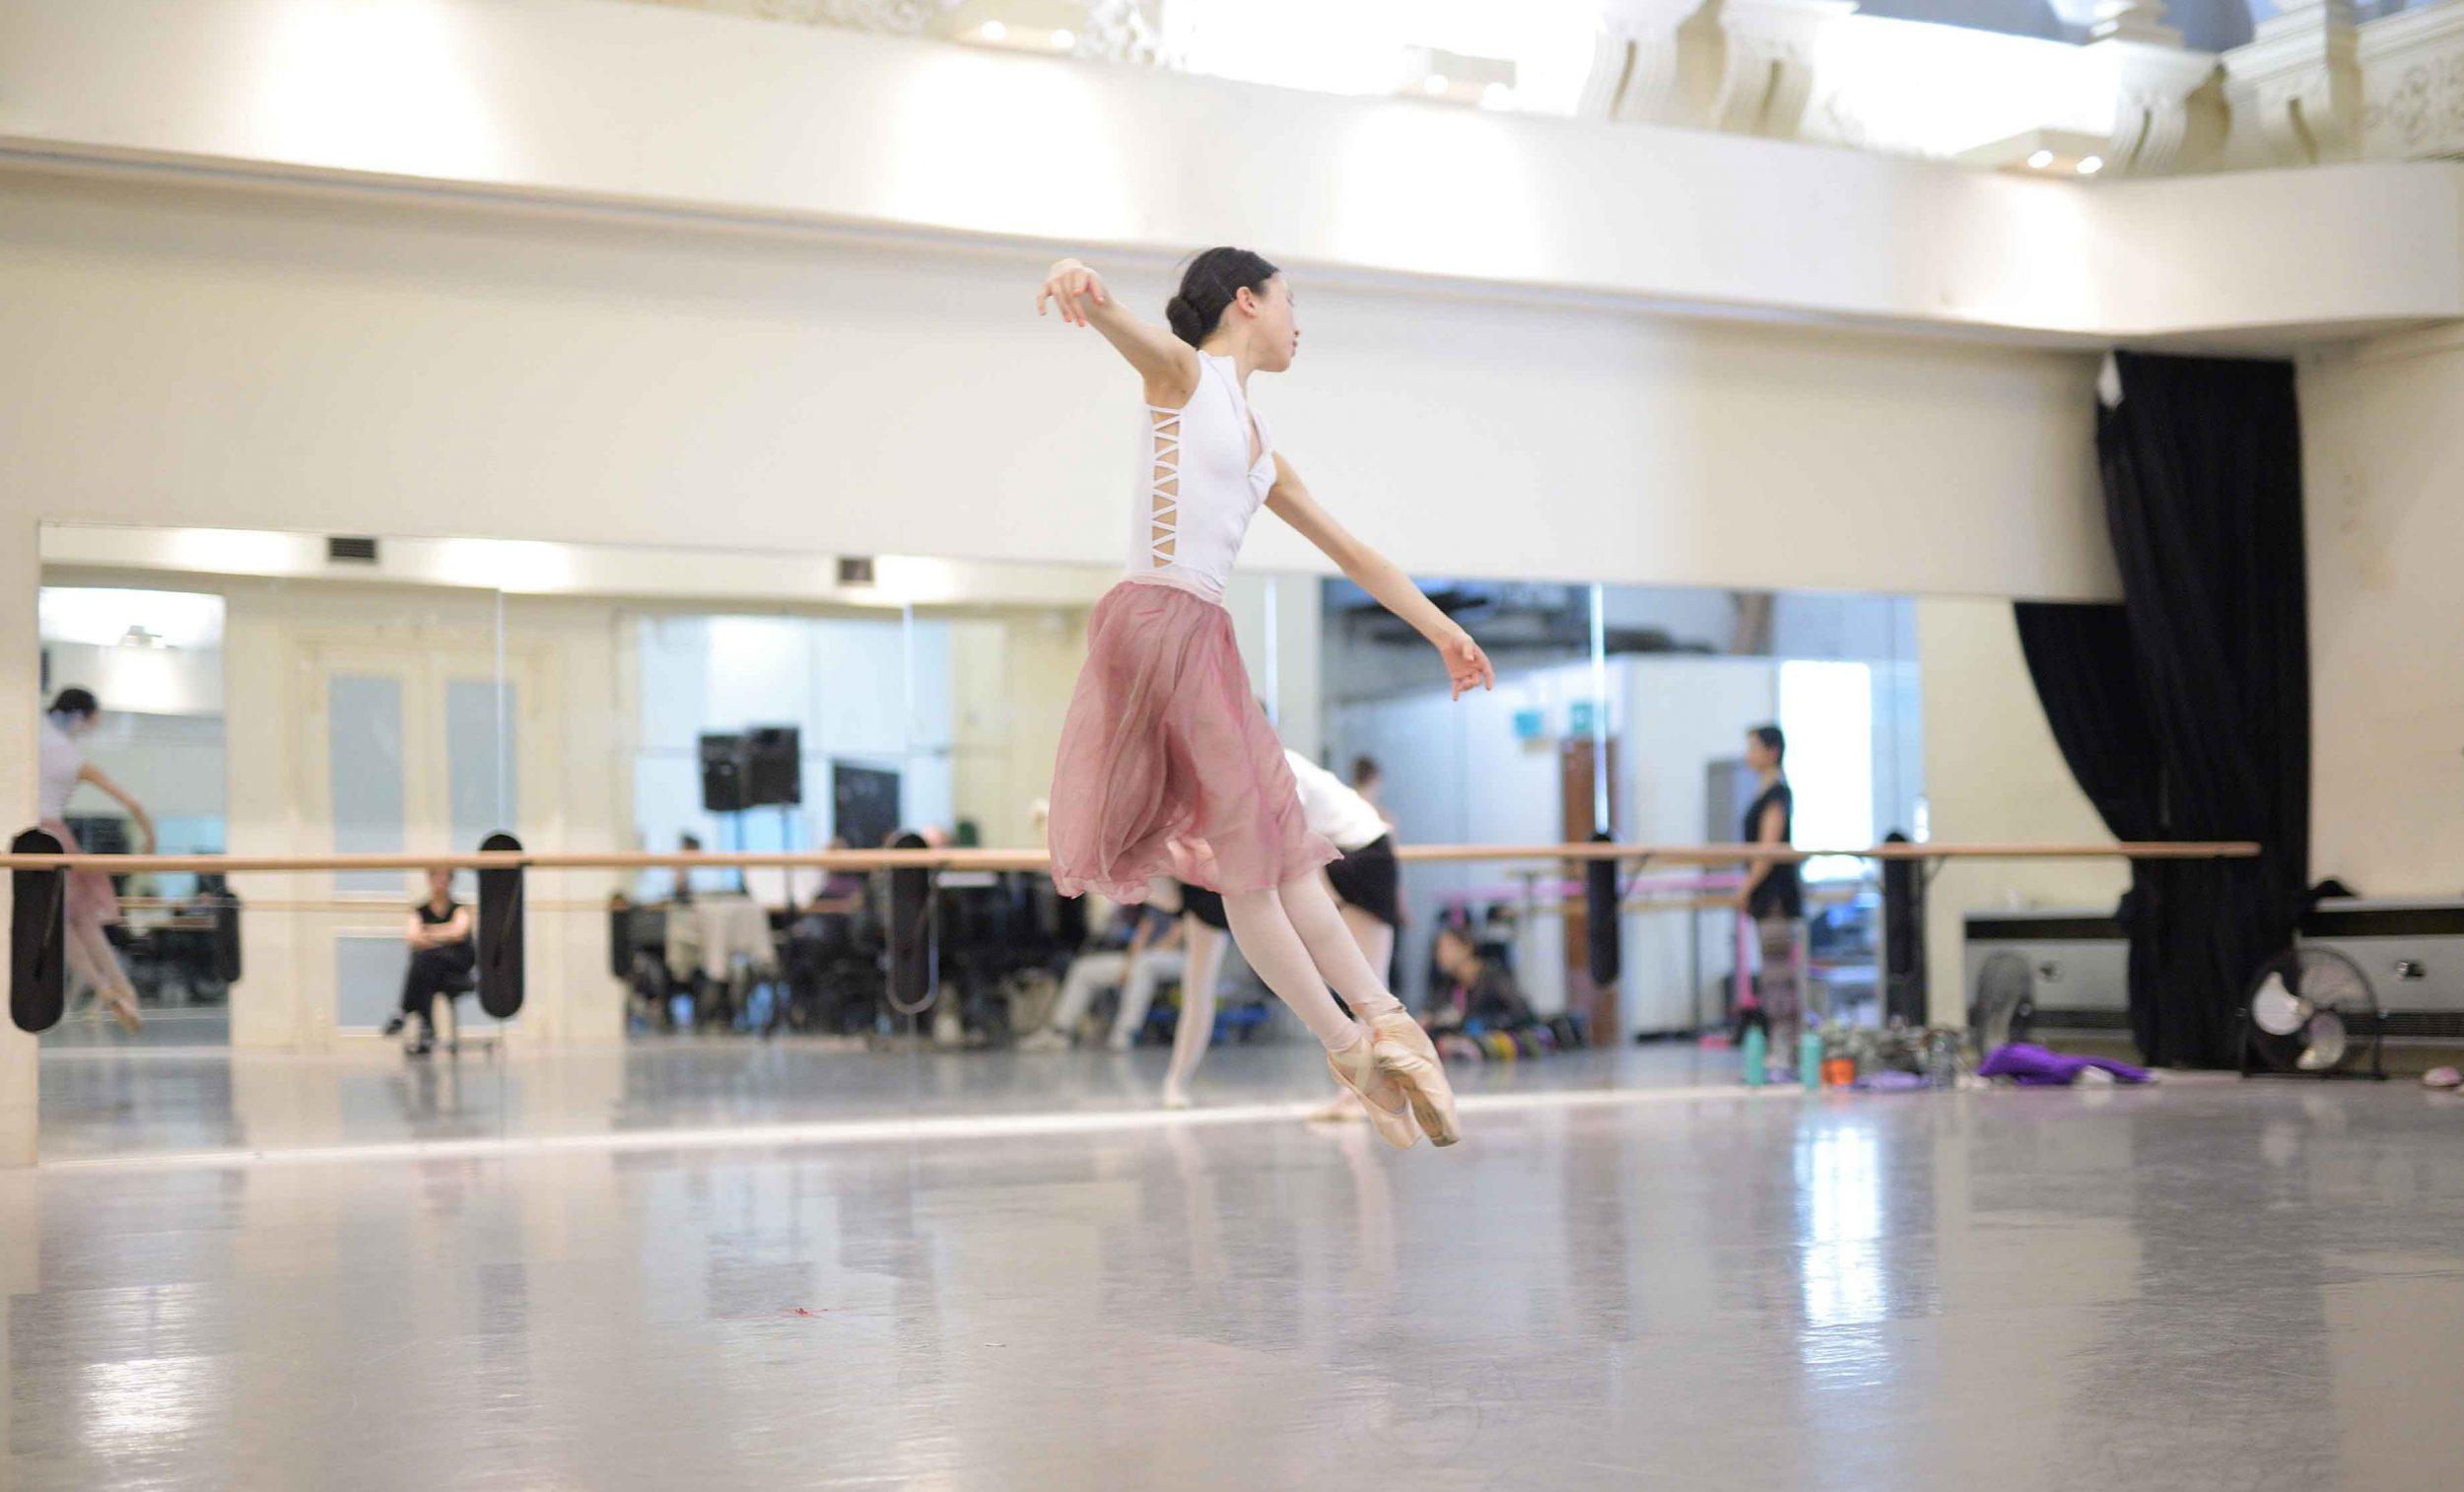 Rina-Kanehara-rehearsing-La-Sylphide-©-Laurent-Liotardo